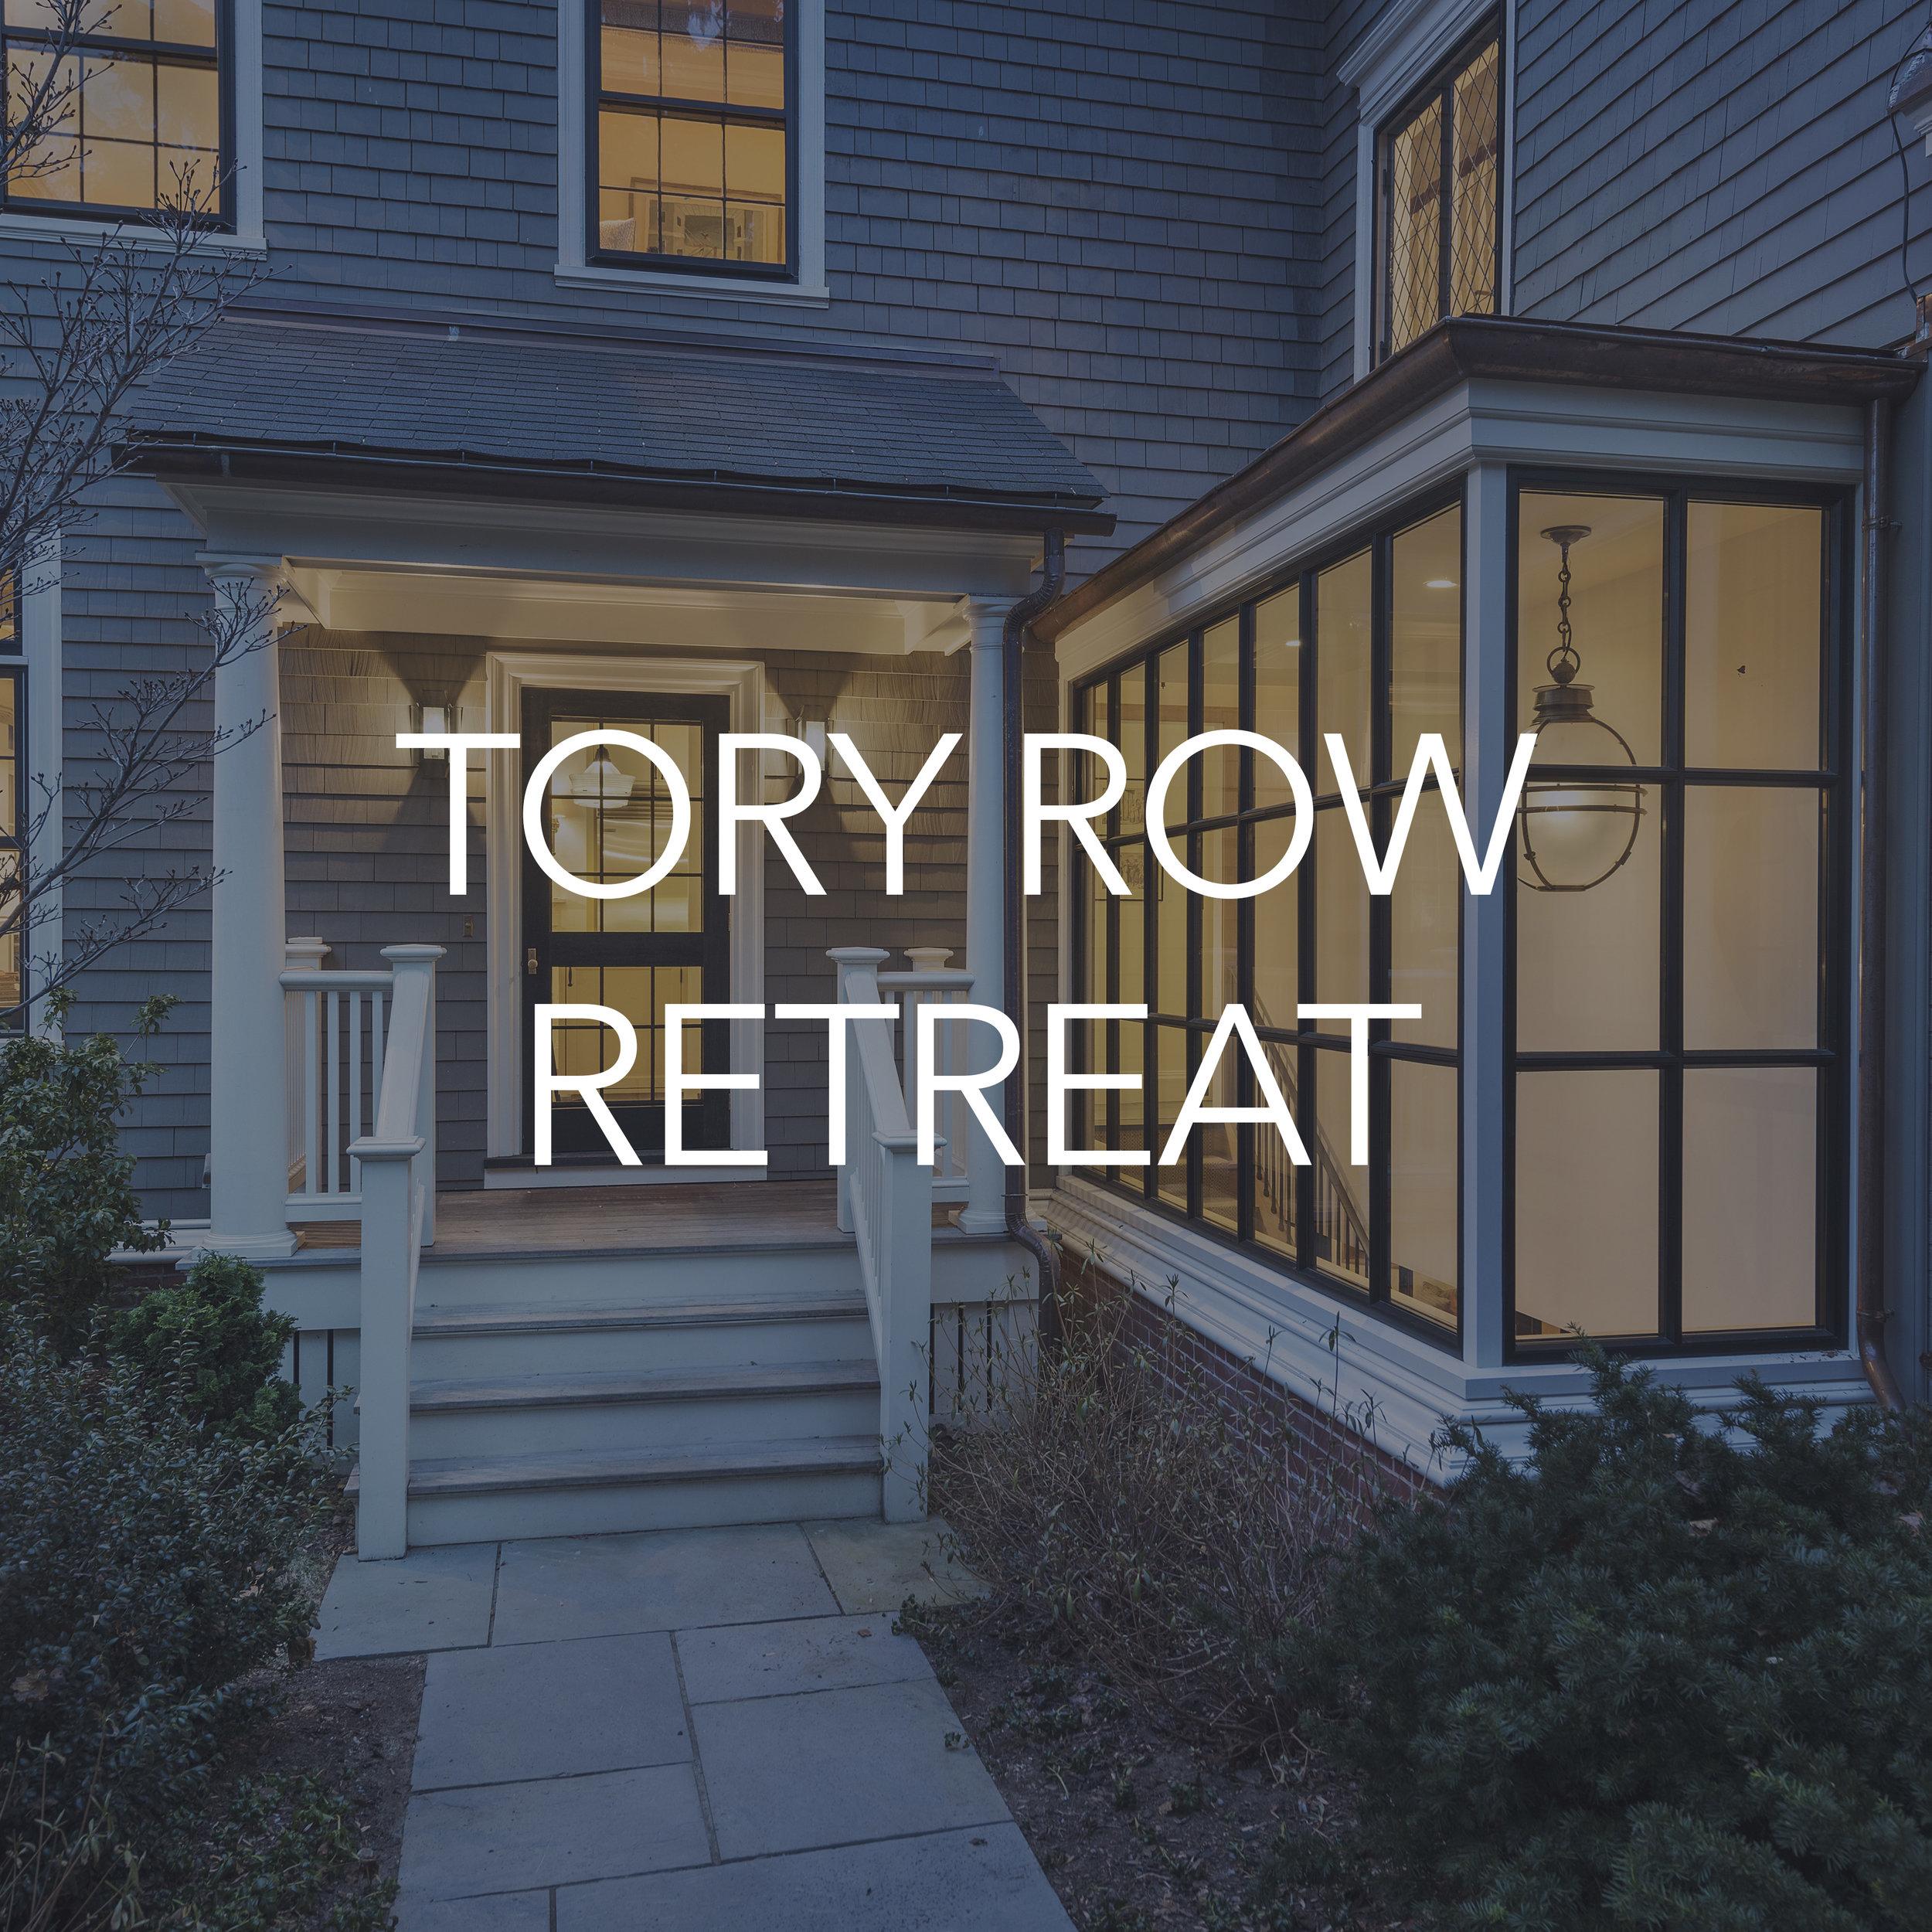 TORY ROW RETREAT.jpg